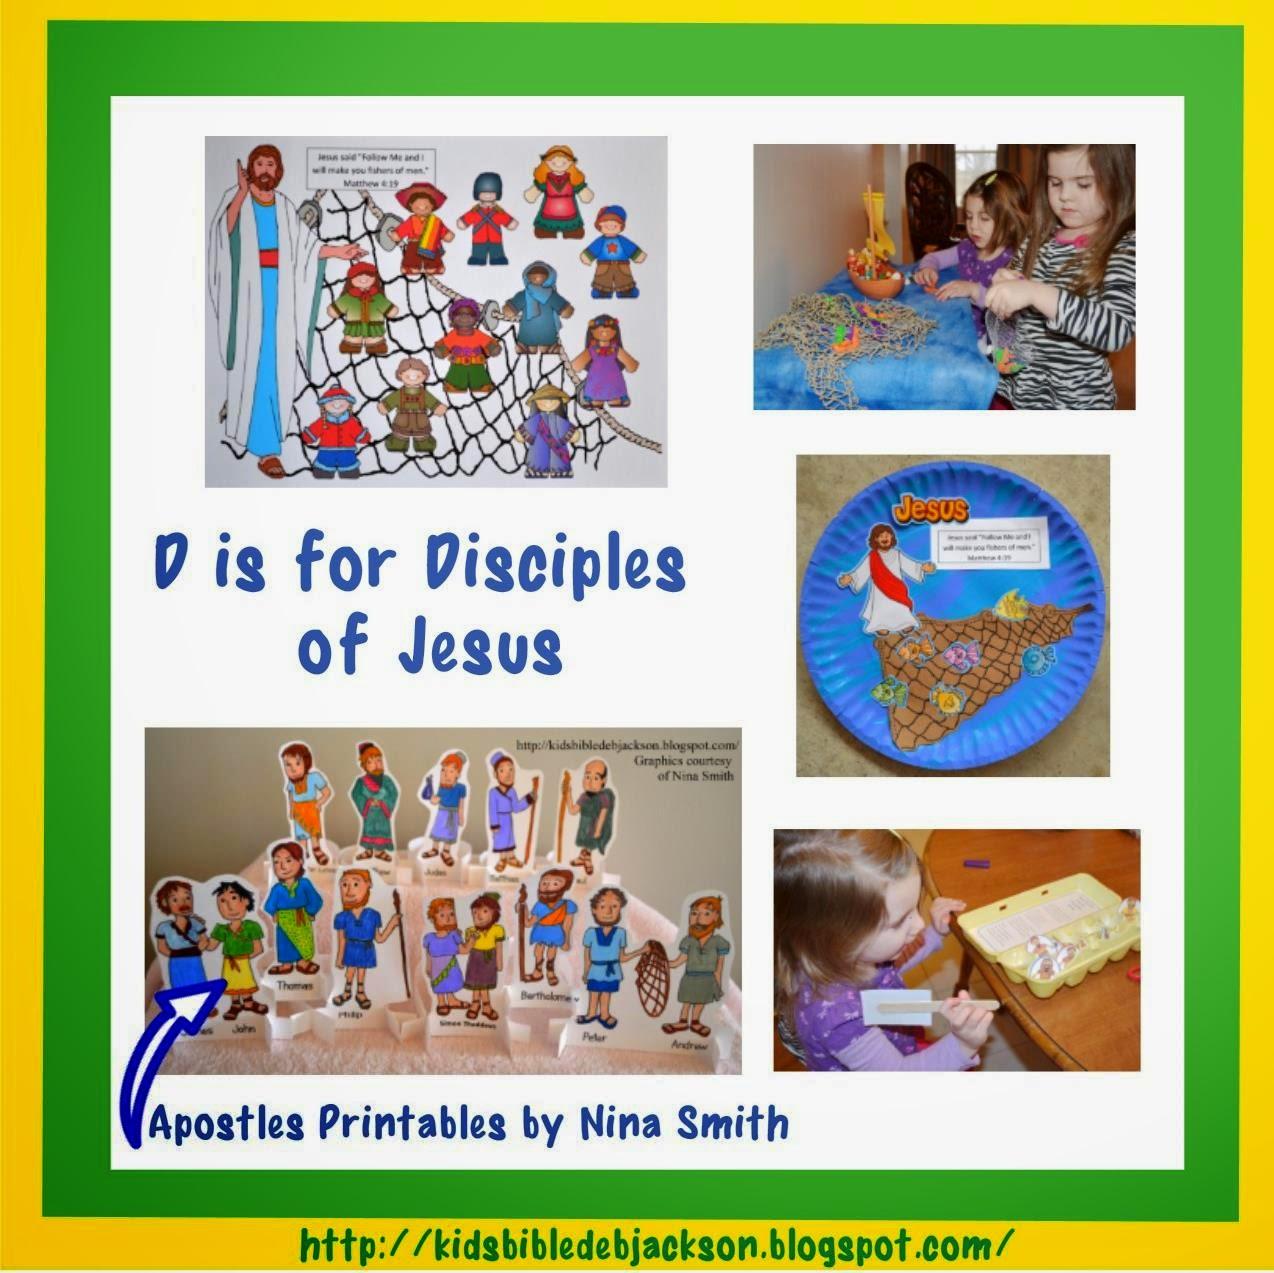 http://kidsbibledebjackson.blogspot.com/2014/03/preschool-alphabet-d-is-for-disciples.html